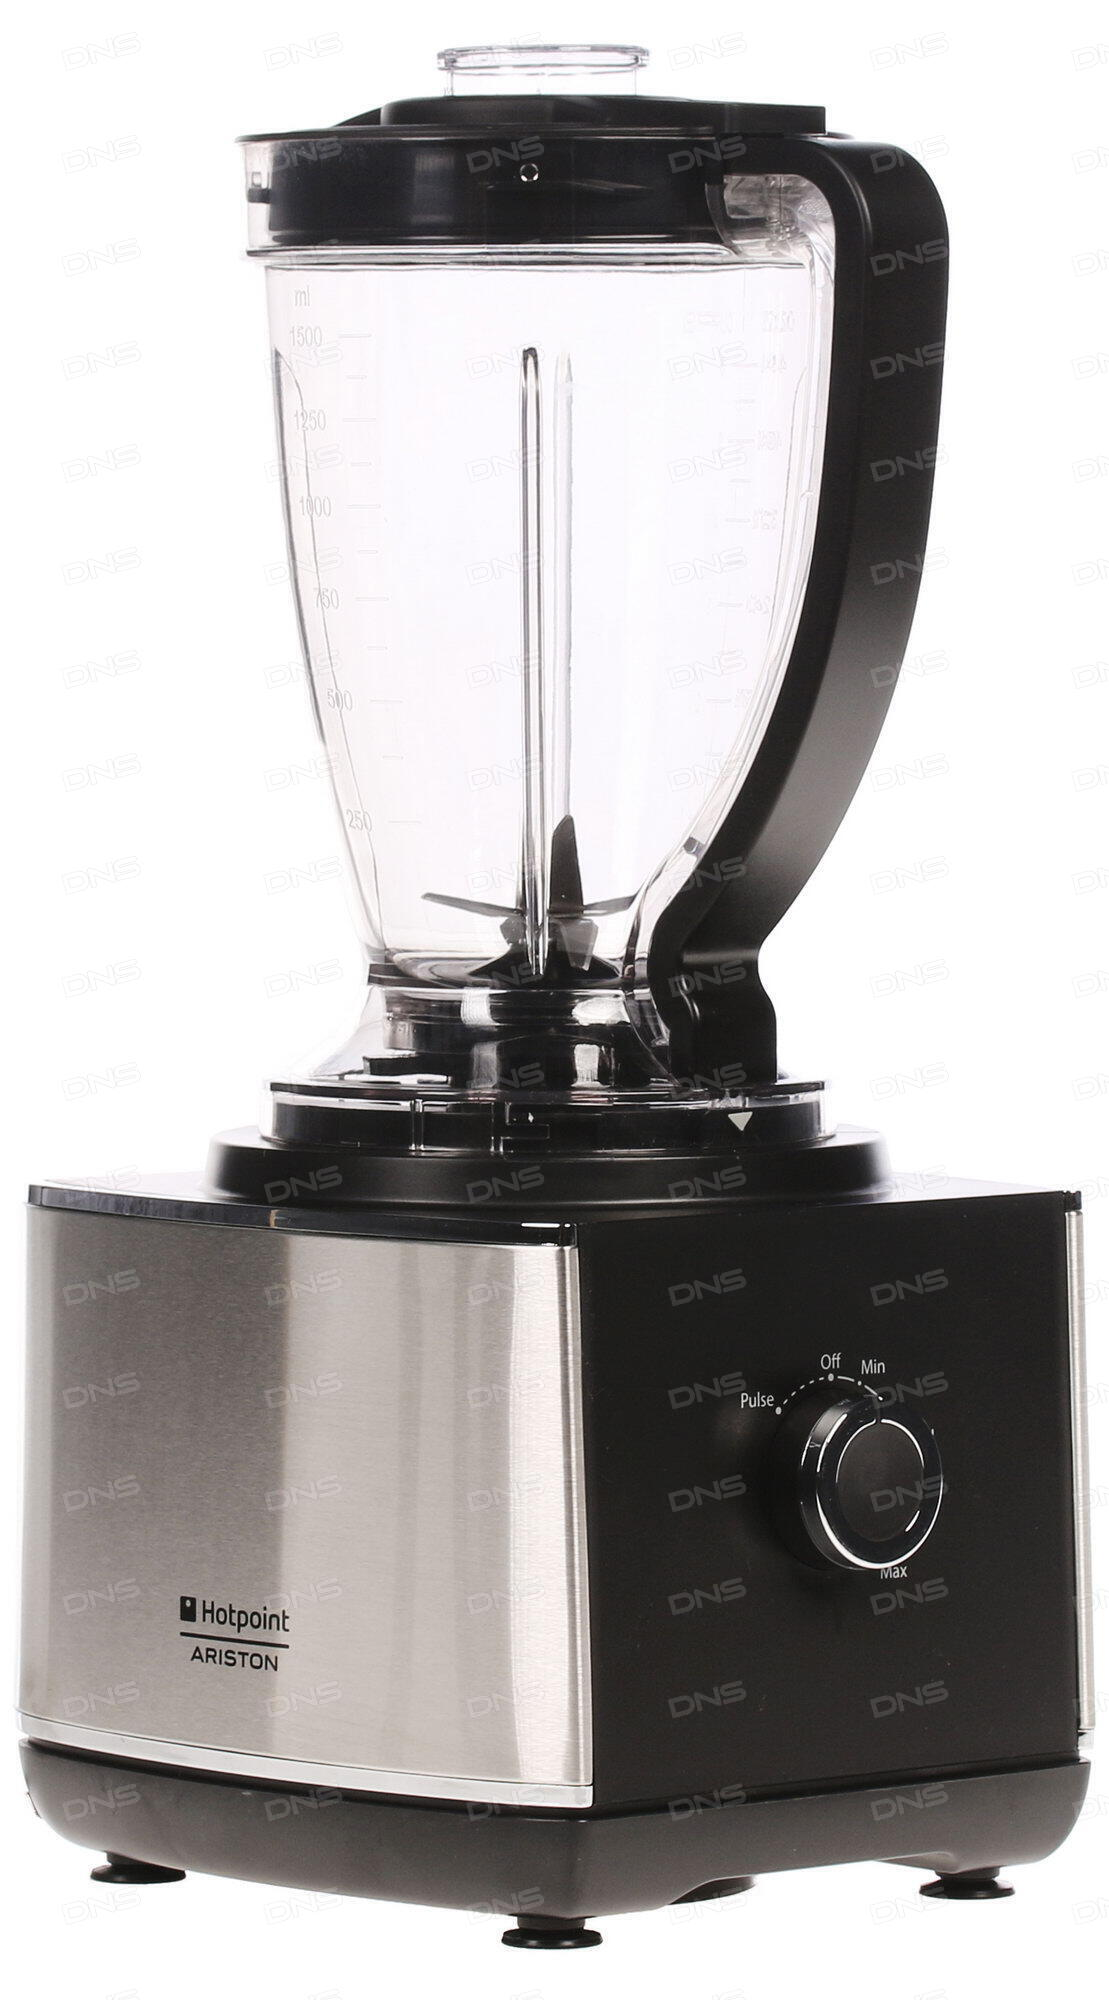 эл схема двигателя кухонного комбайна комбайна тефаль